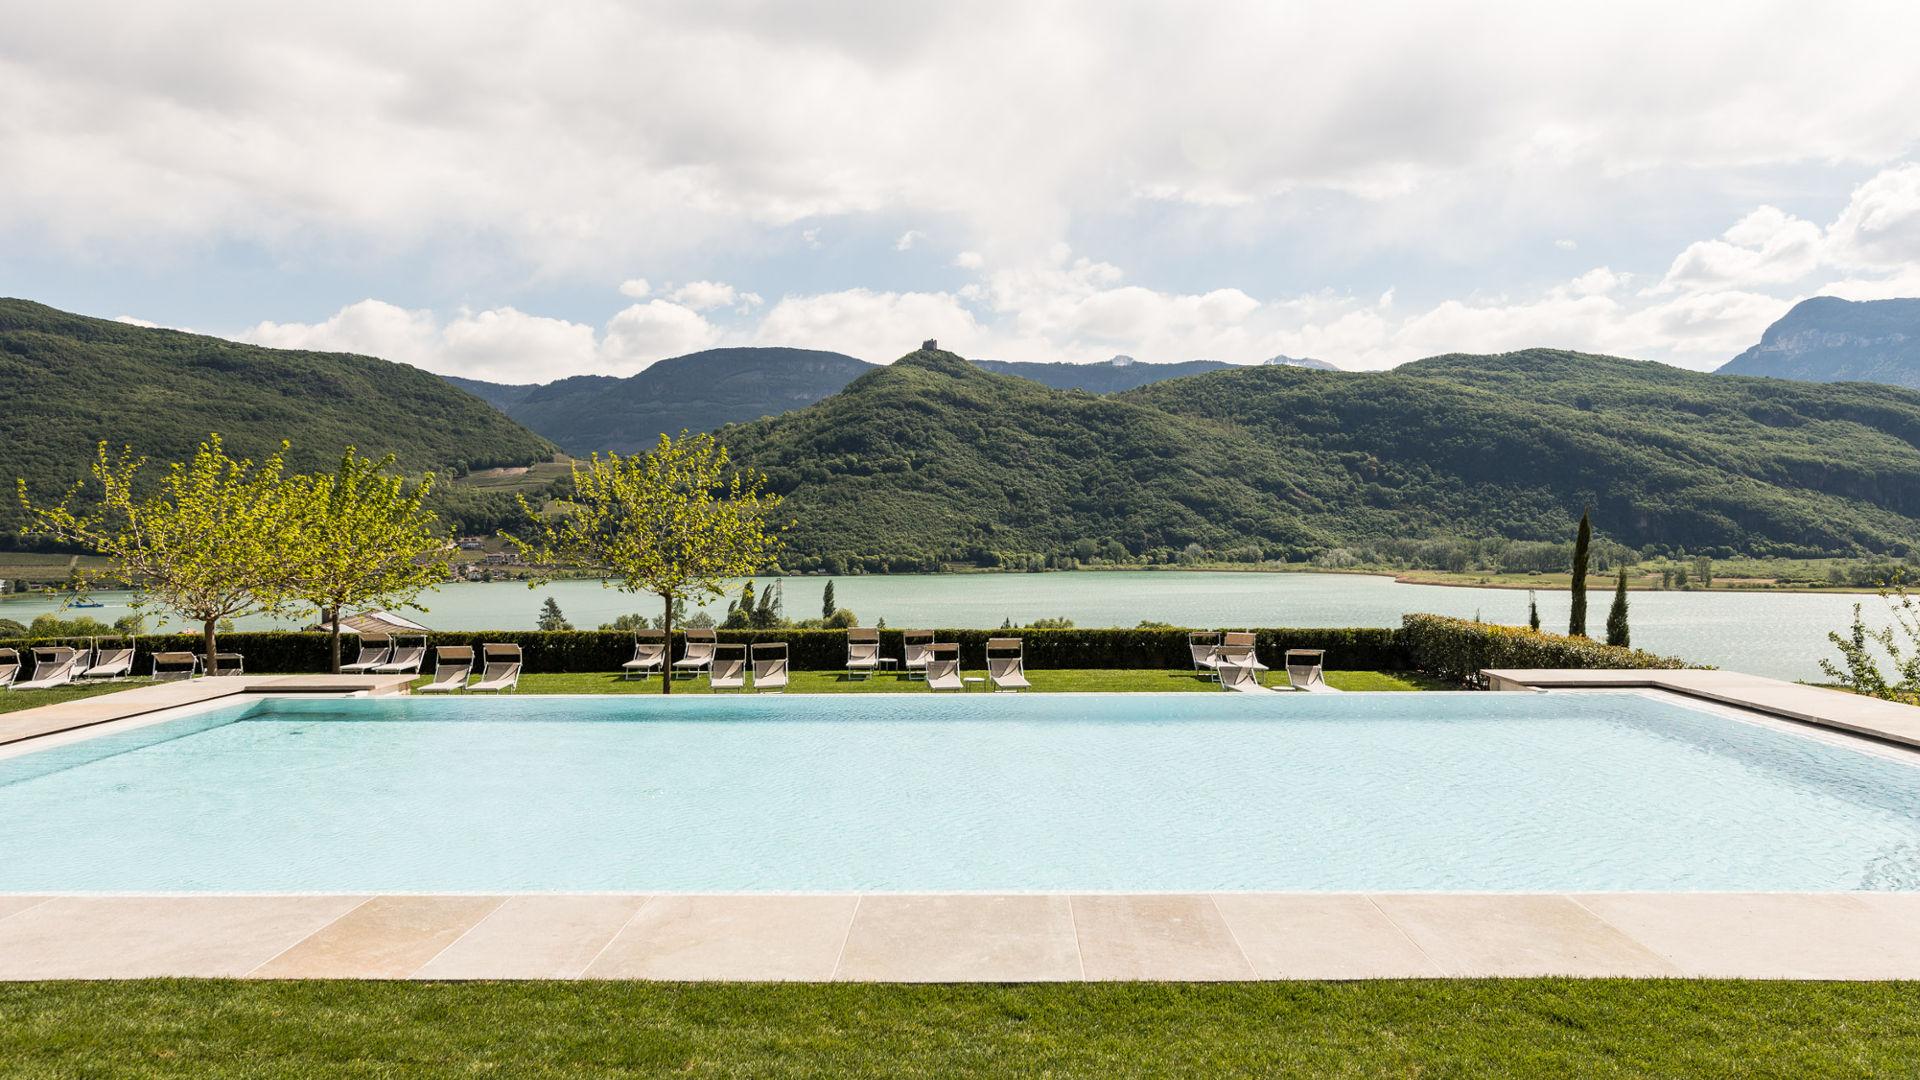 Hotel Hasslhof Benessere - piscina infinity lago di caldaro